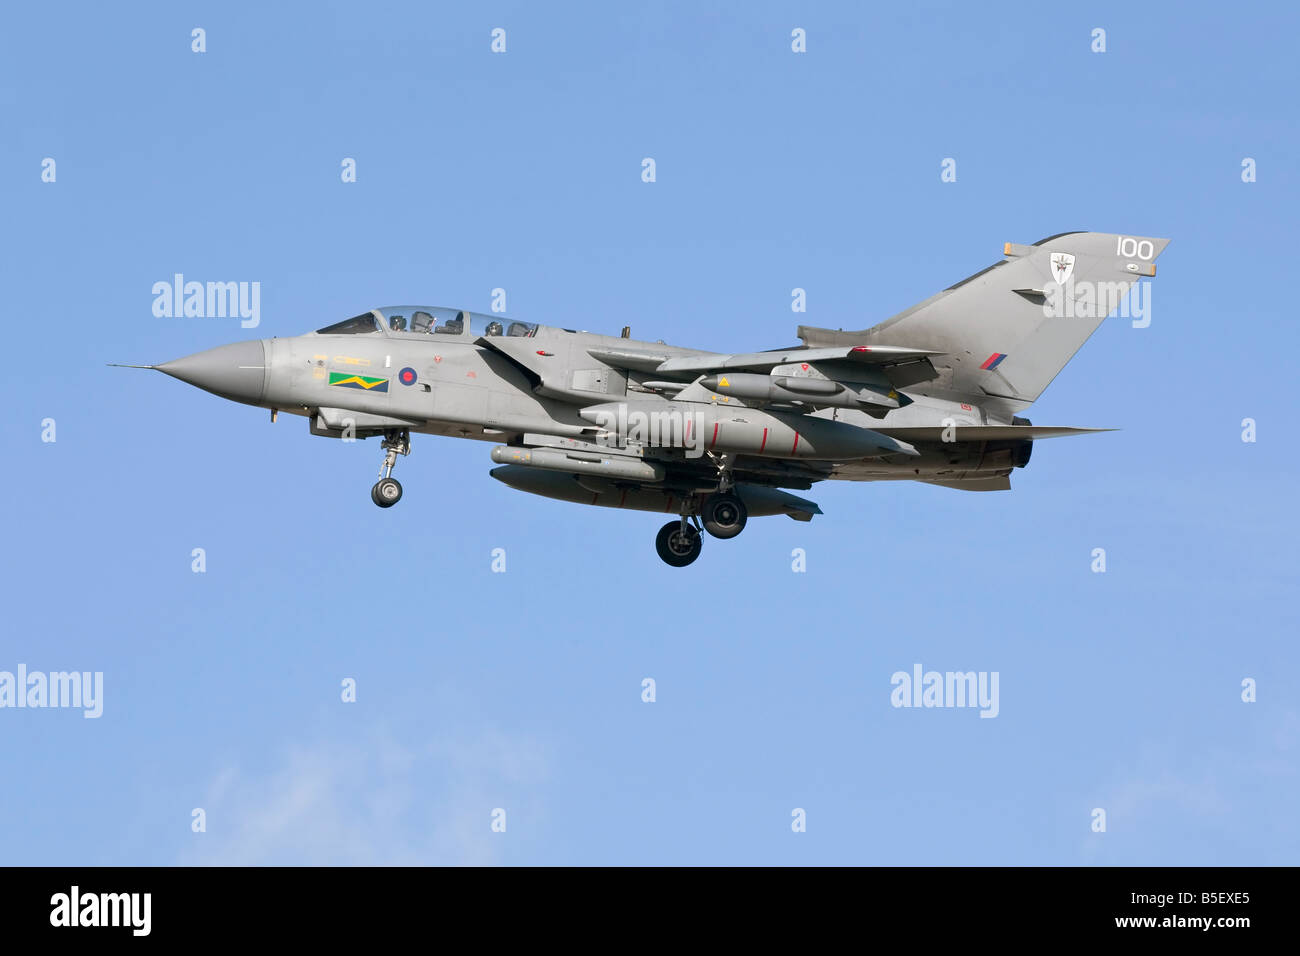 Bae British aerospace Tornado GR4 - Stock Image